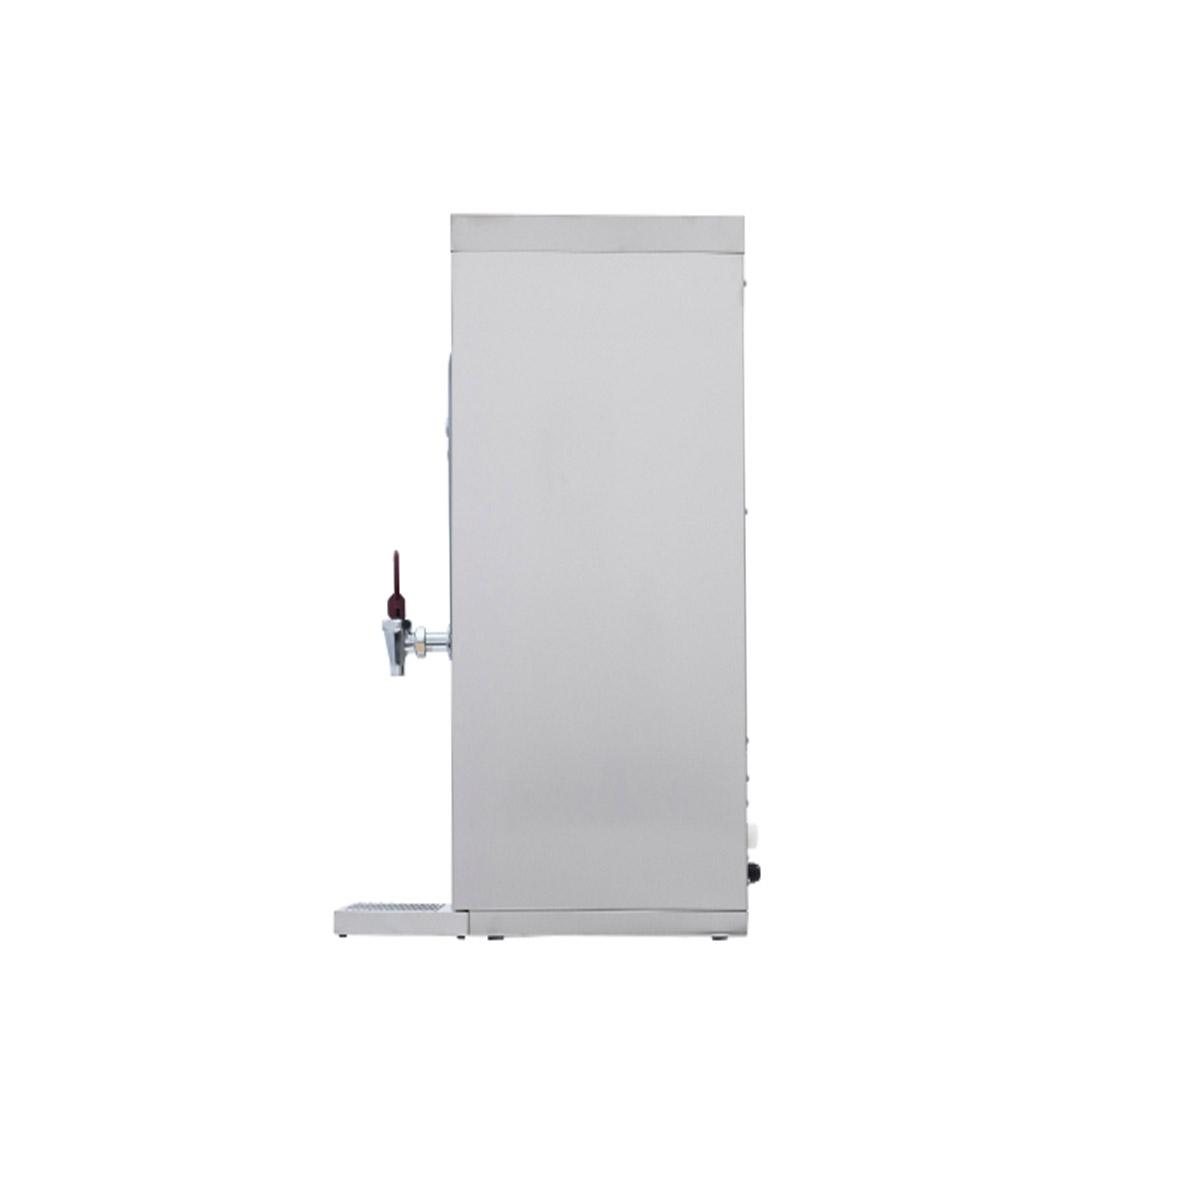 Instanta Sureflow Counter Top Slimline Water Boiler CTS13SL 13Ltr